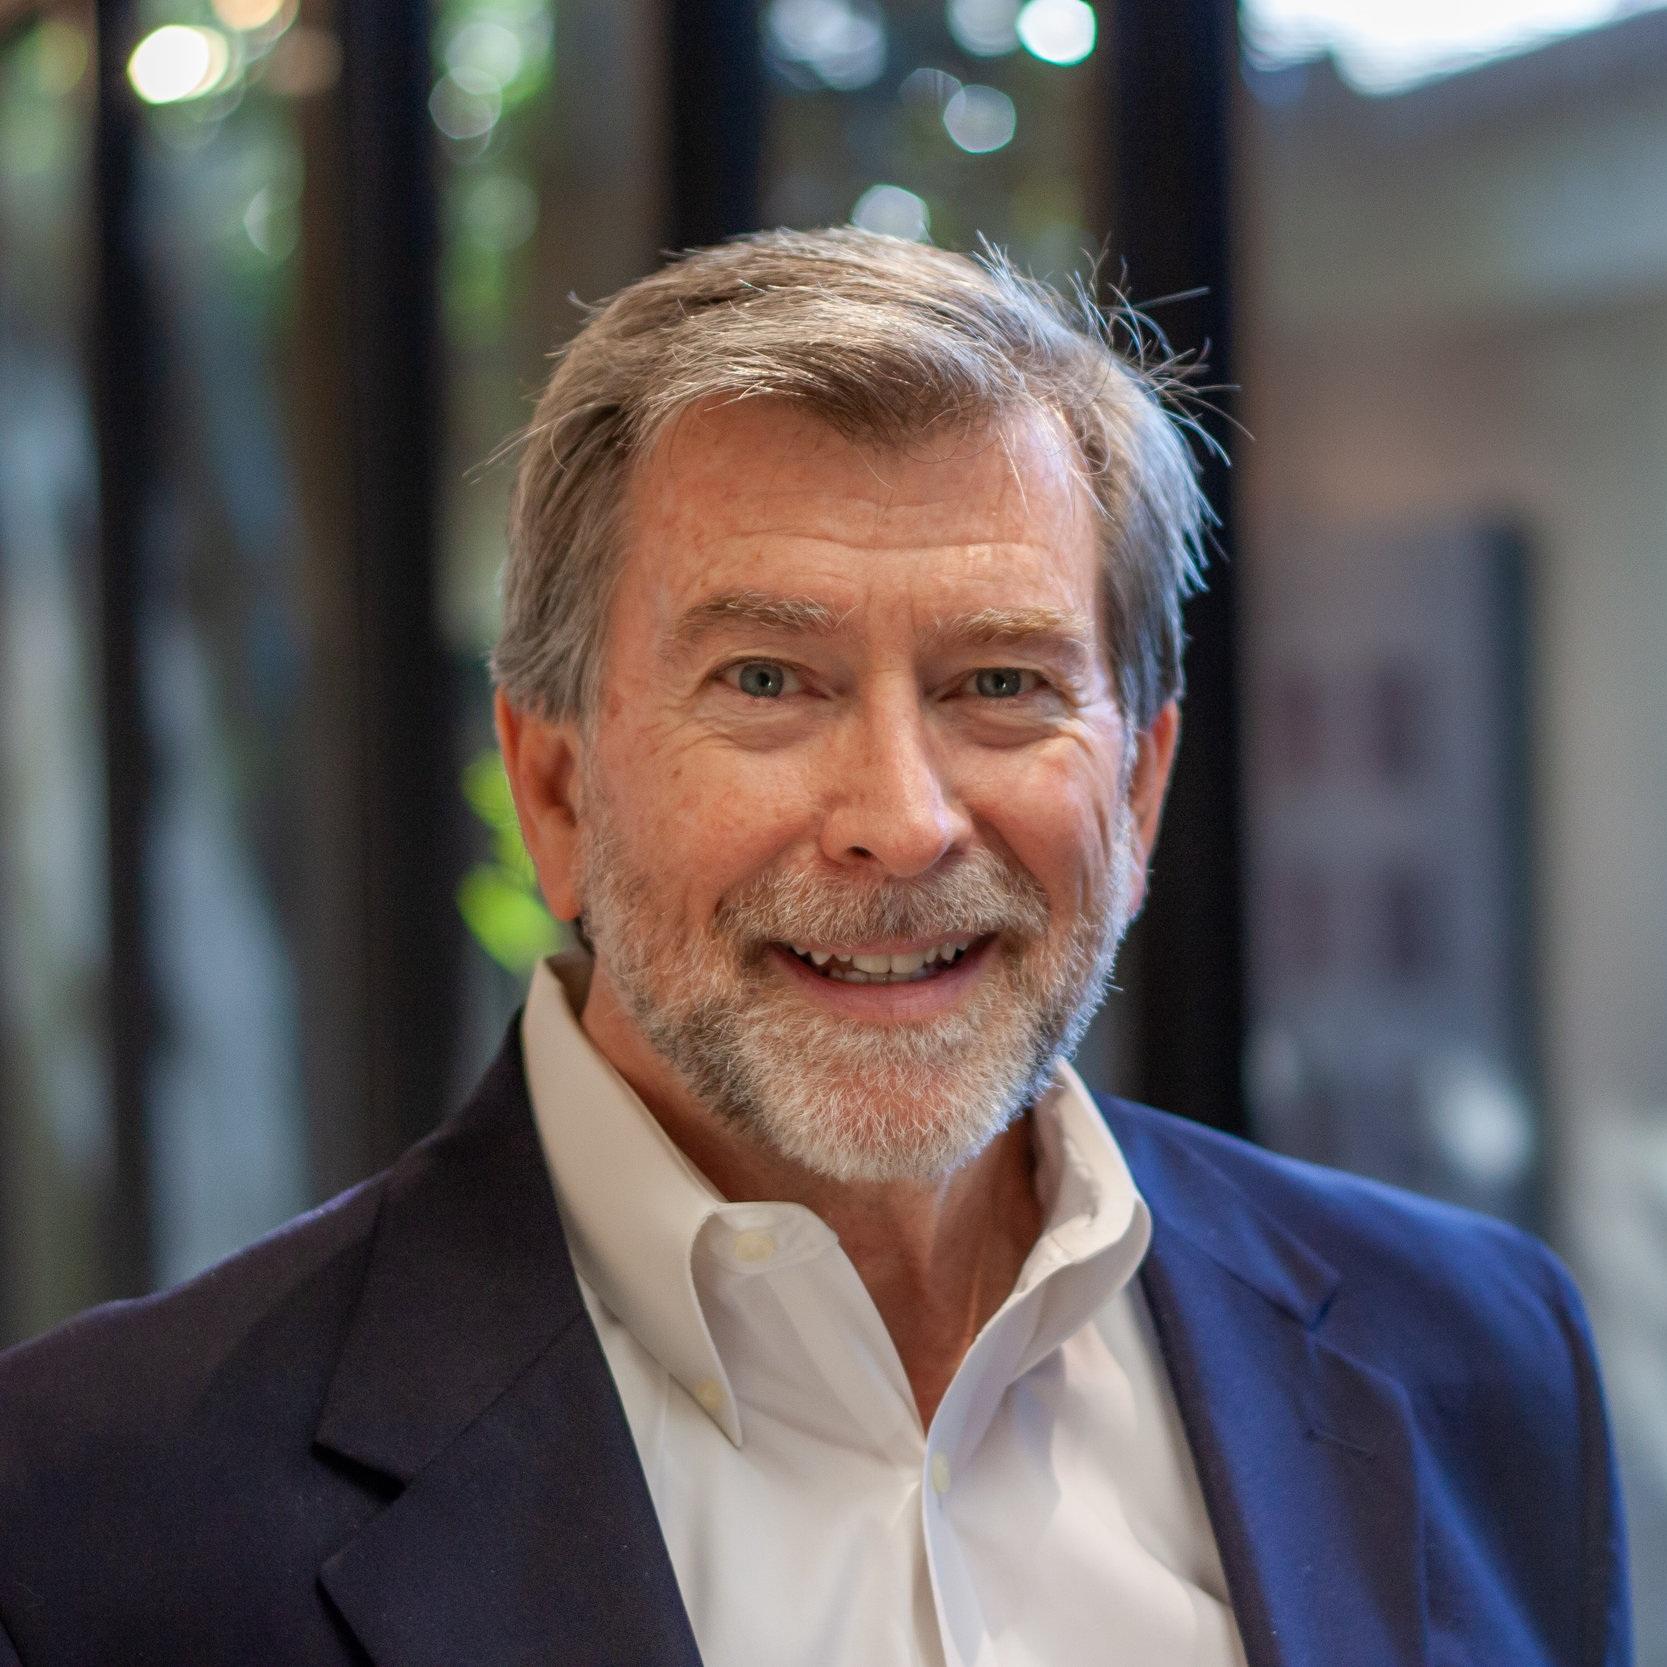 David Cockrill, AIA - Senior Associate Principal